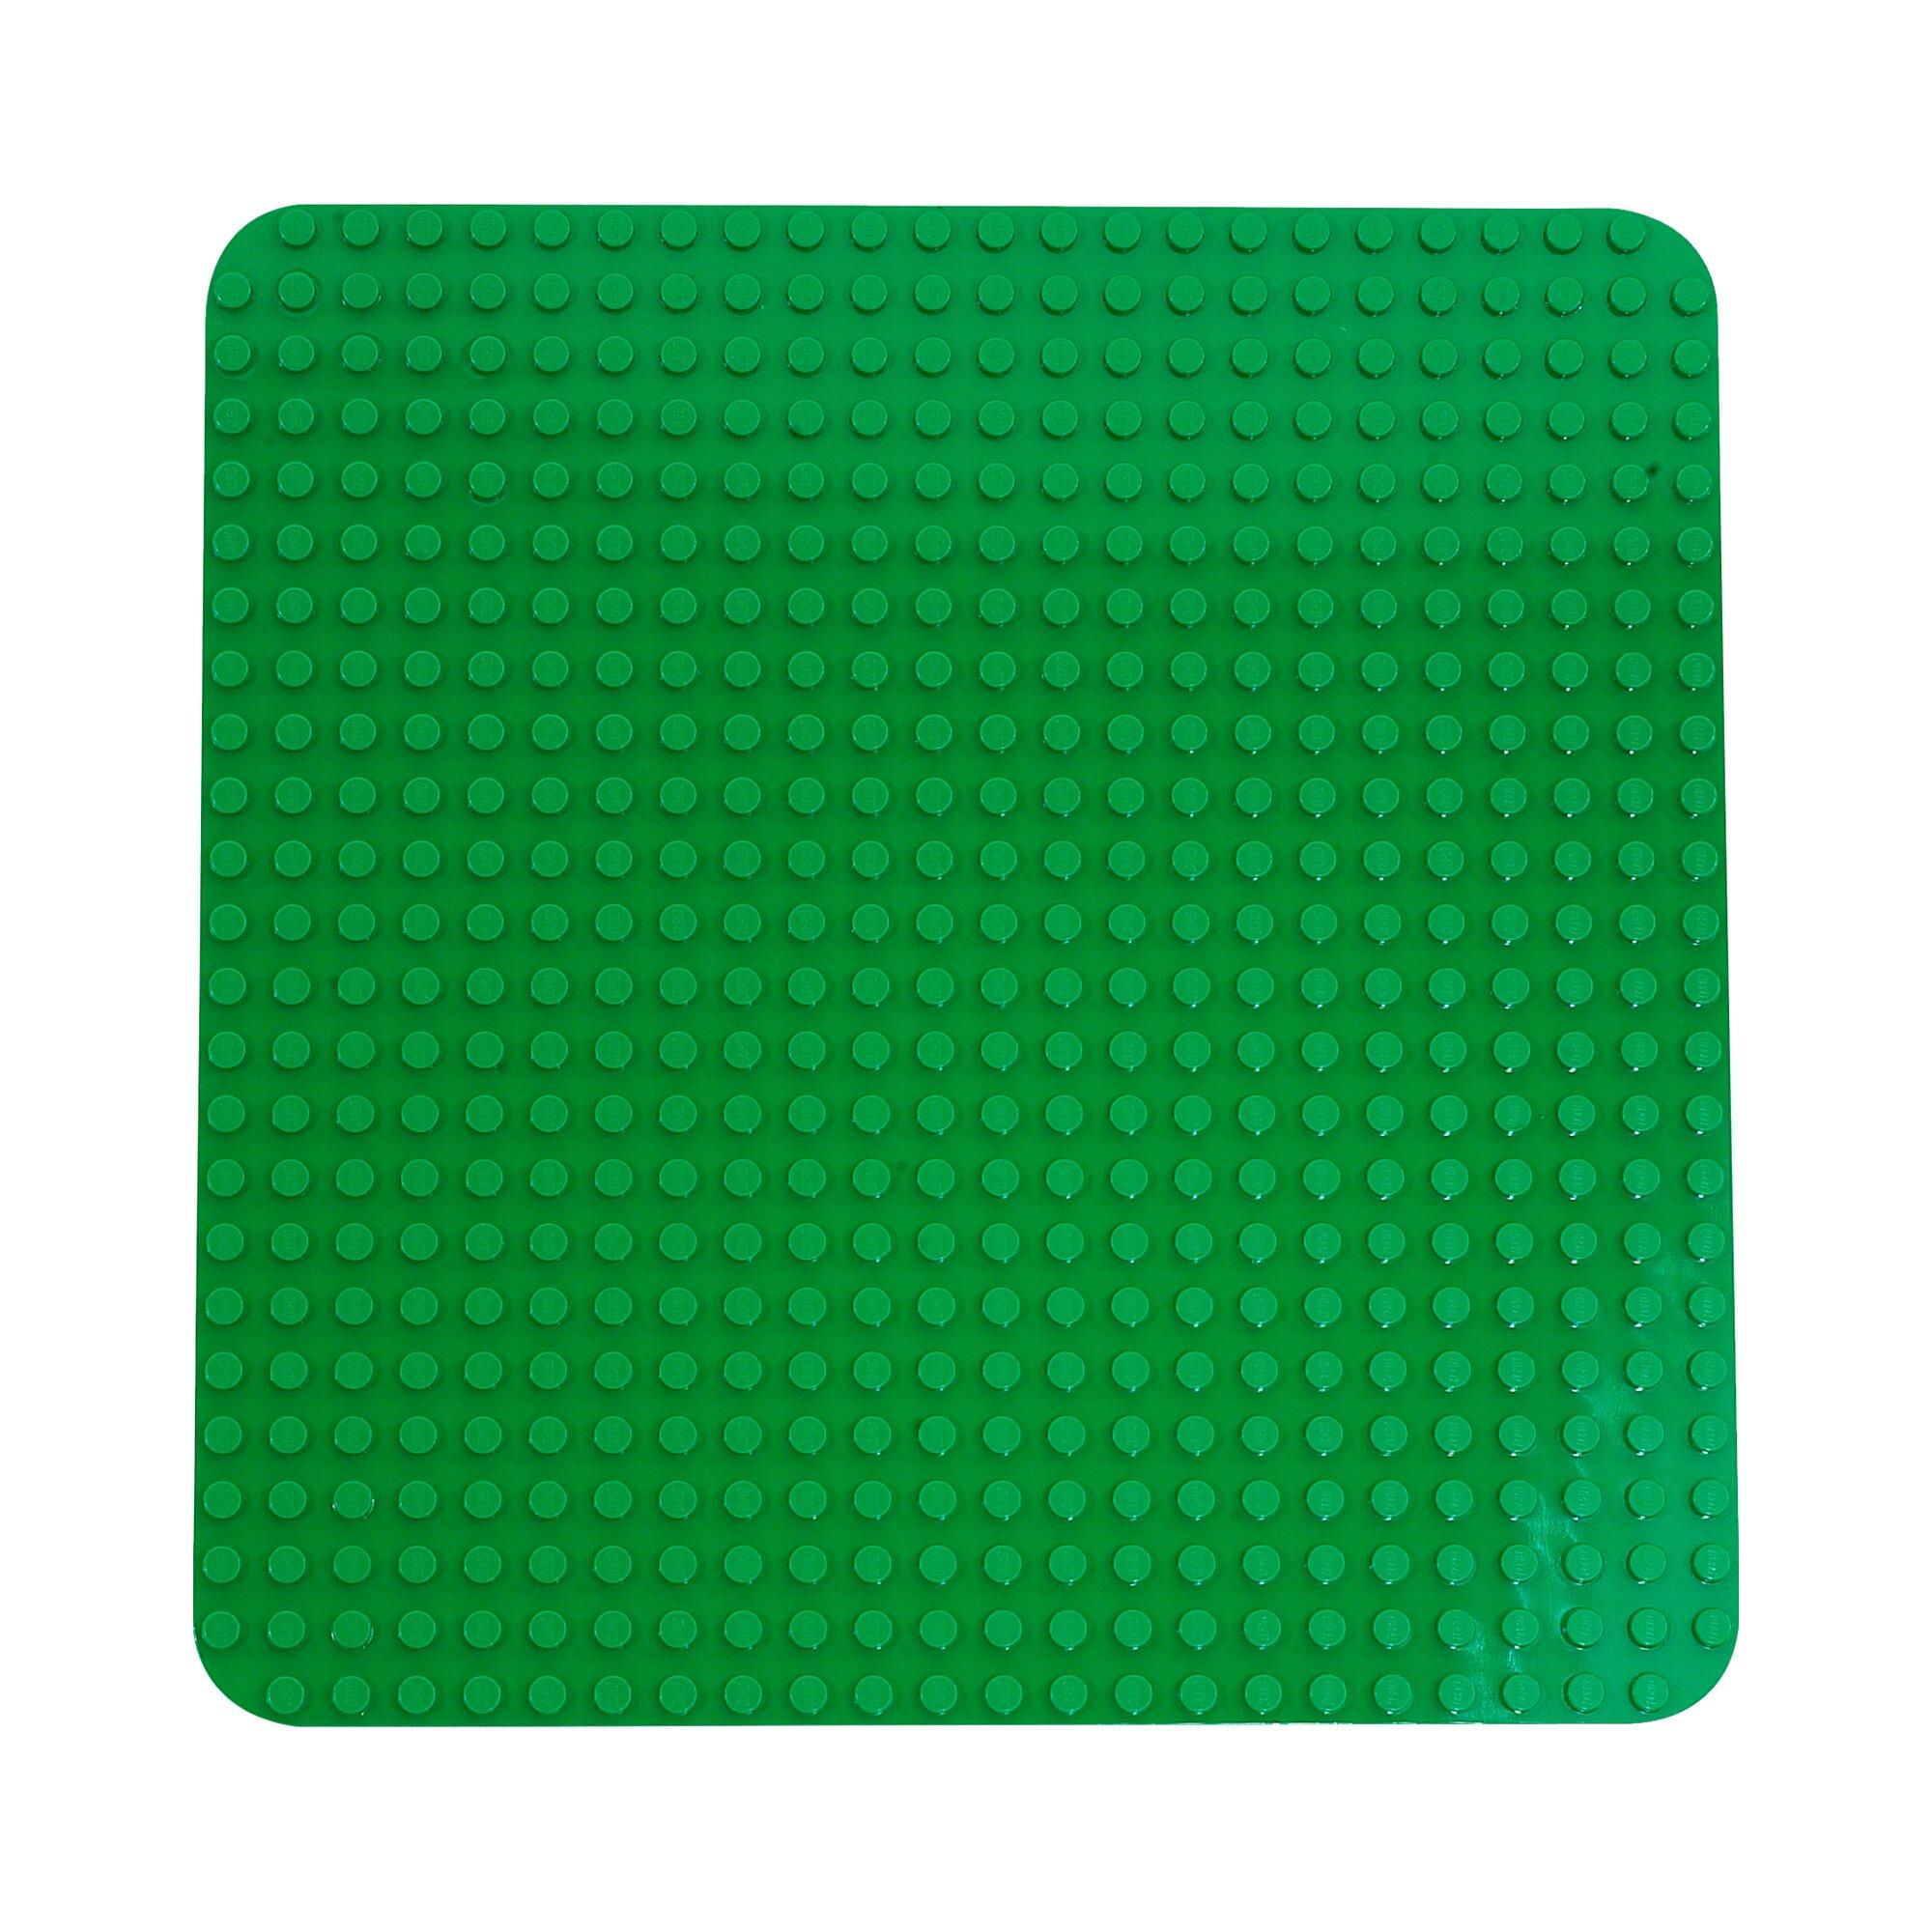 duplo-2304-gro-e-bauplatte-grun